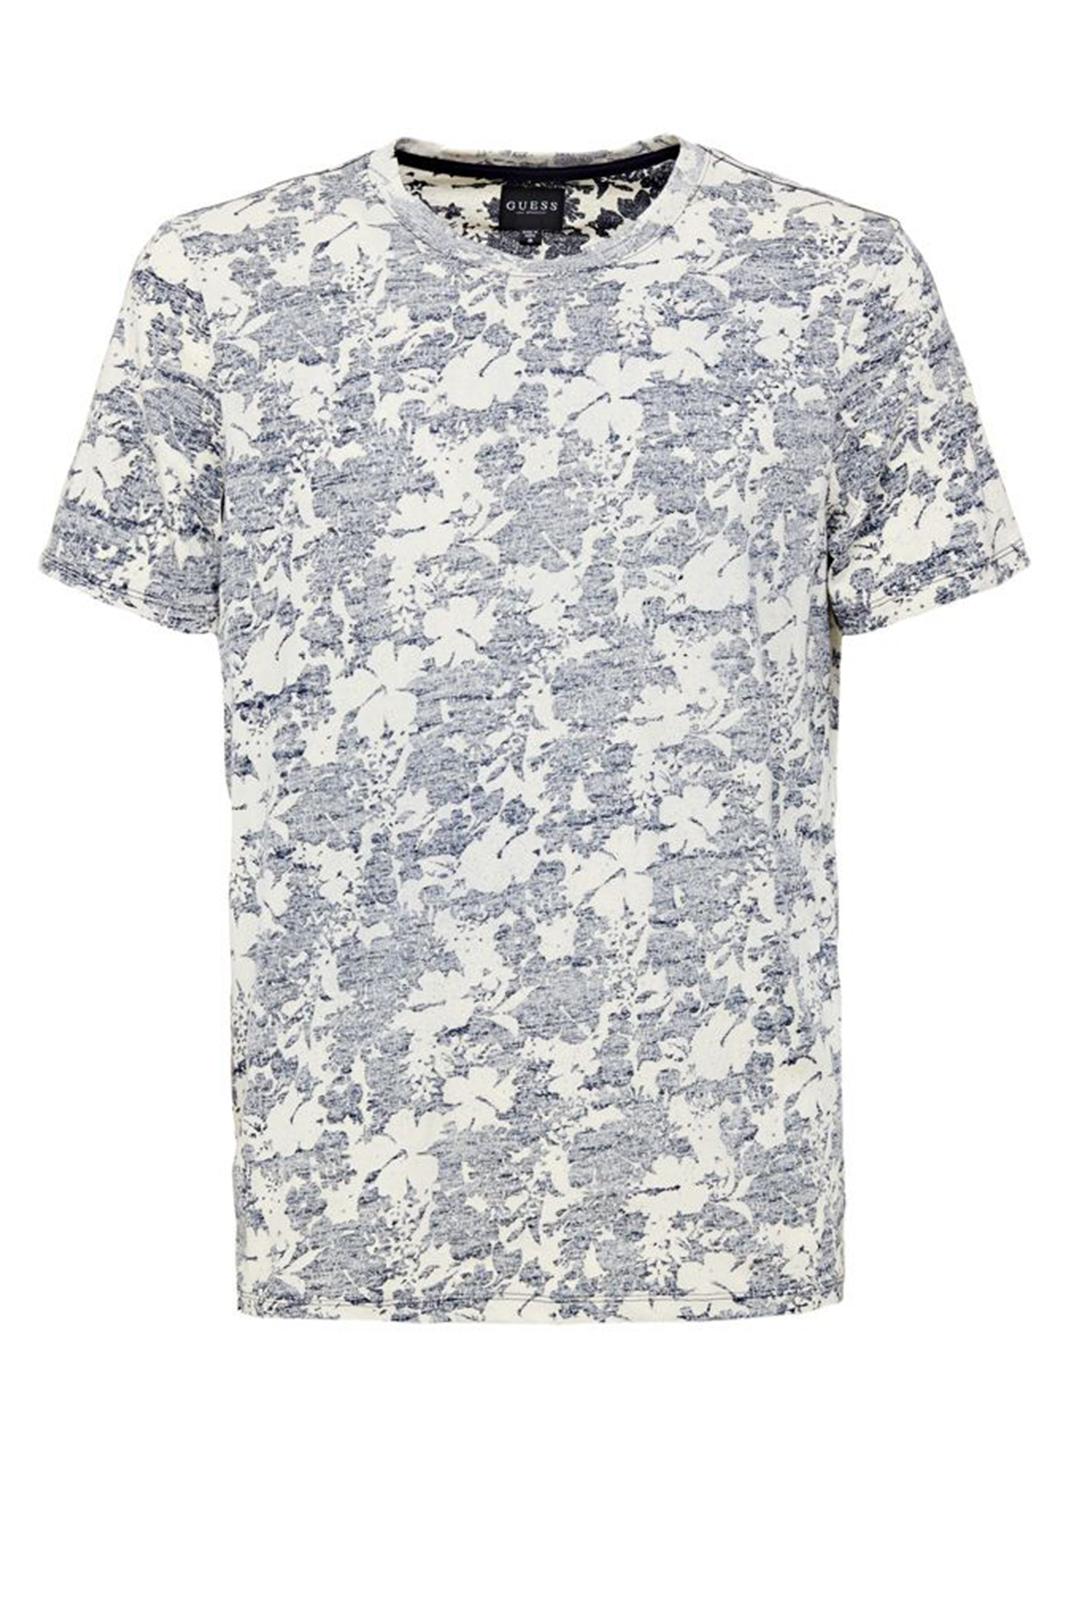 Tee-shirts  Guess jeans M72P75RI5K0 P7H4 BLUE